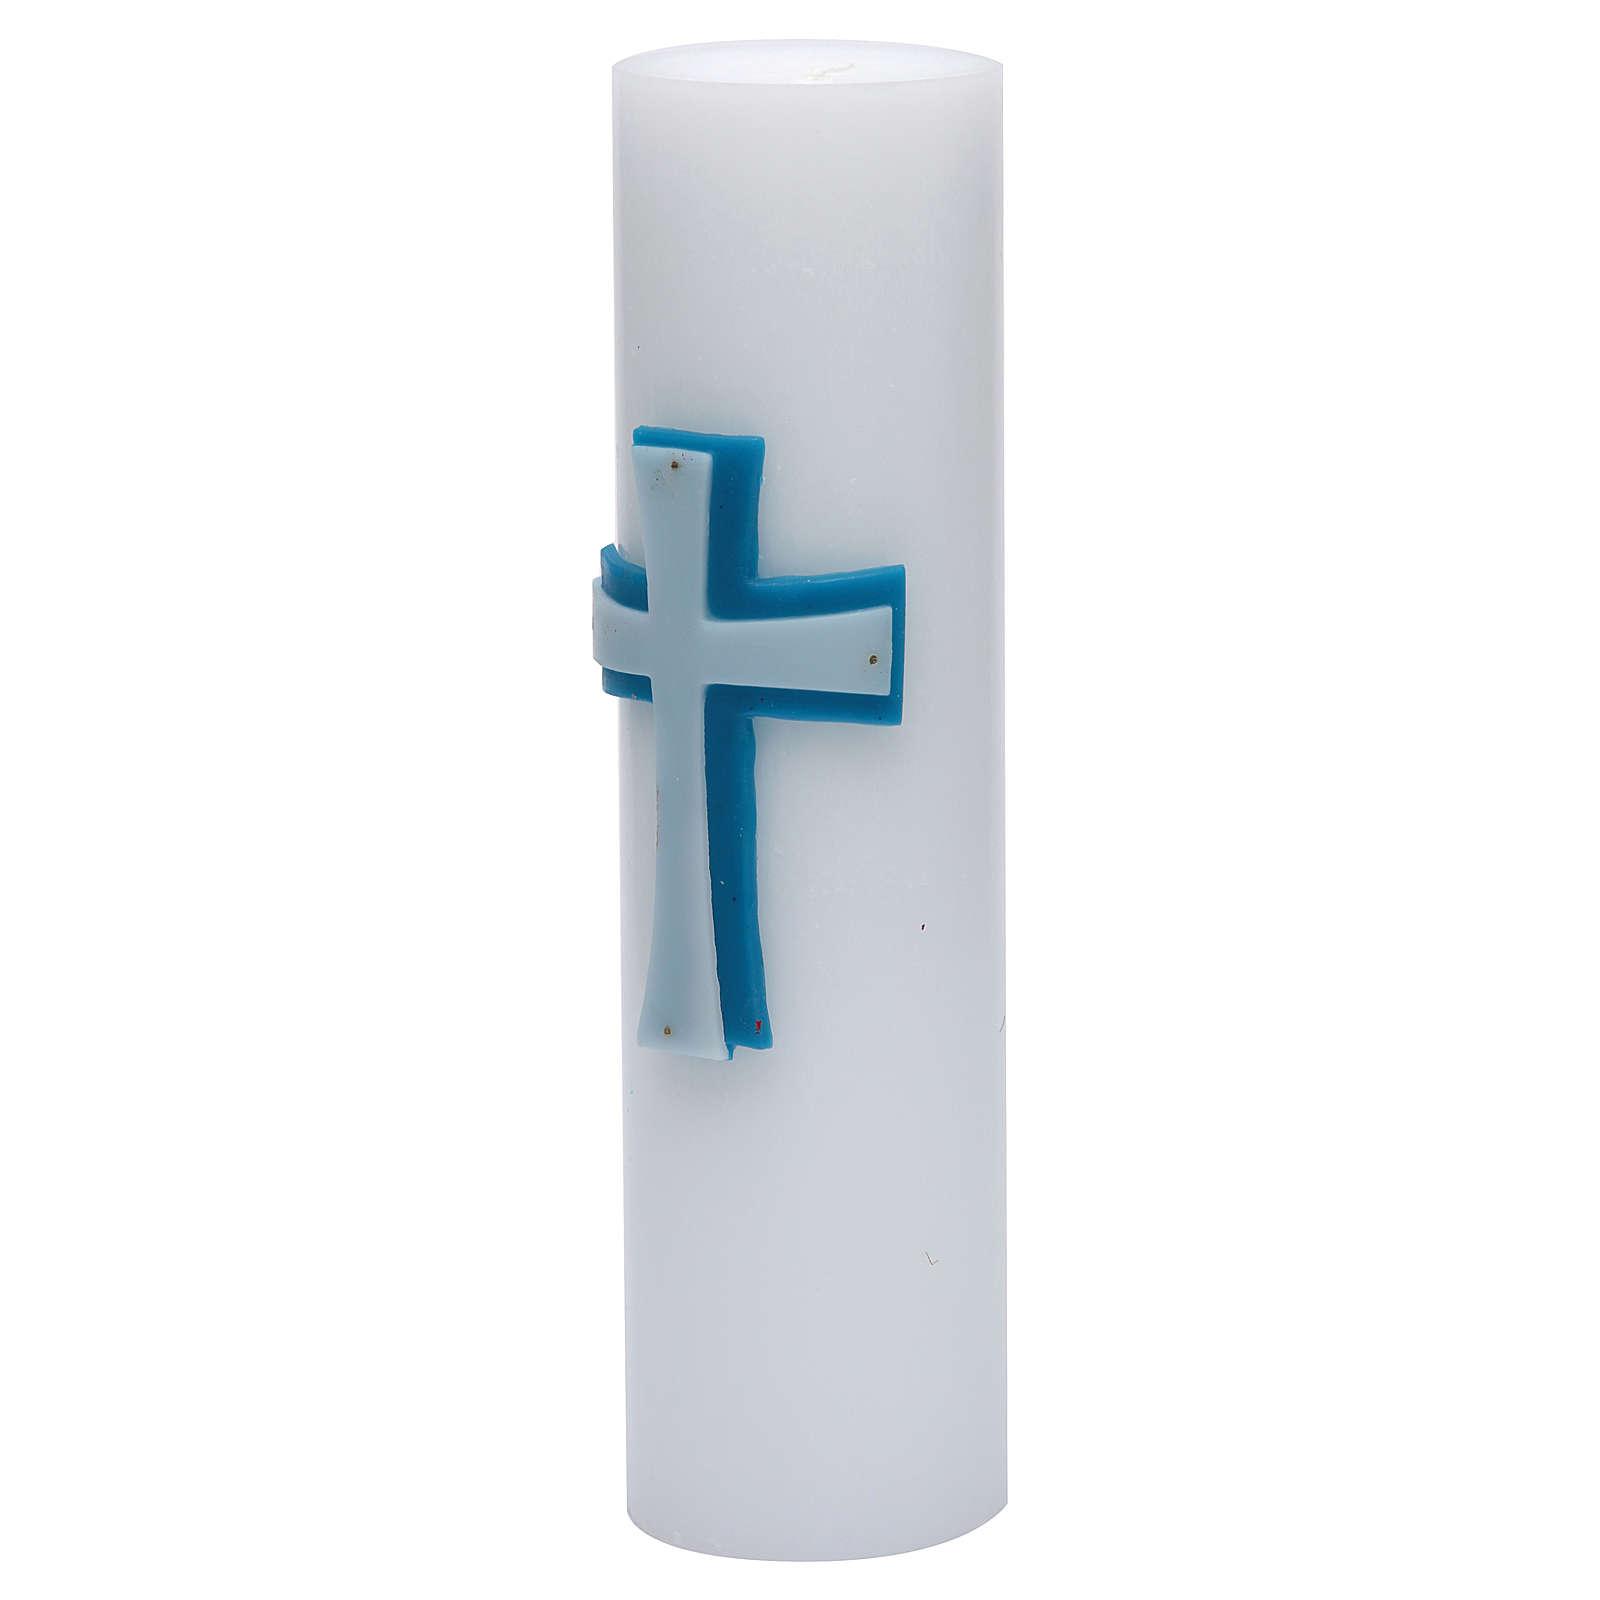 Cero da altare bassorilievo cera api croce blu diam 8 cm 3